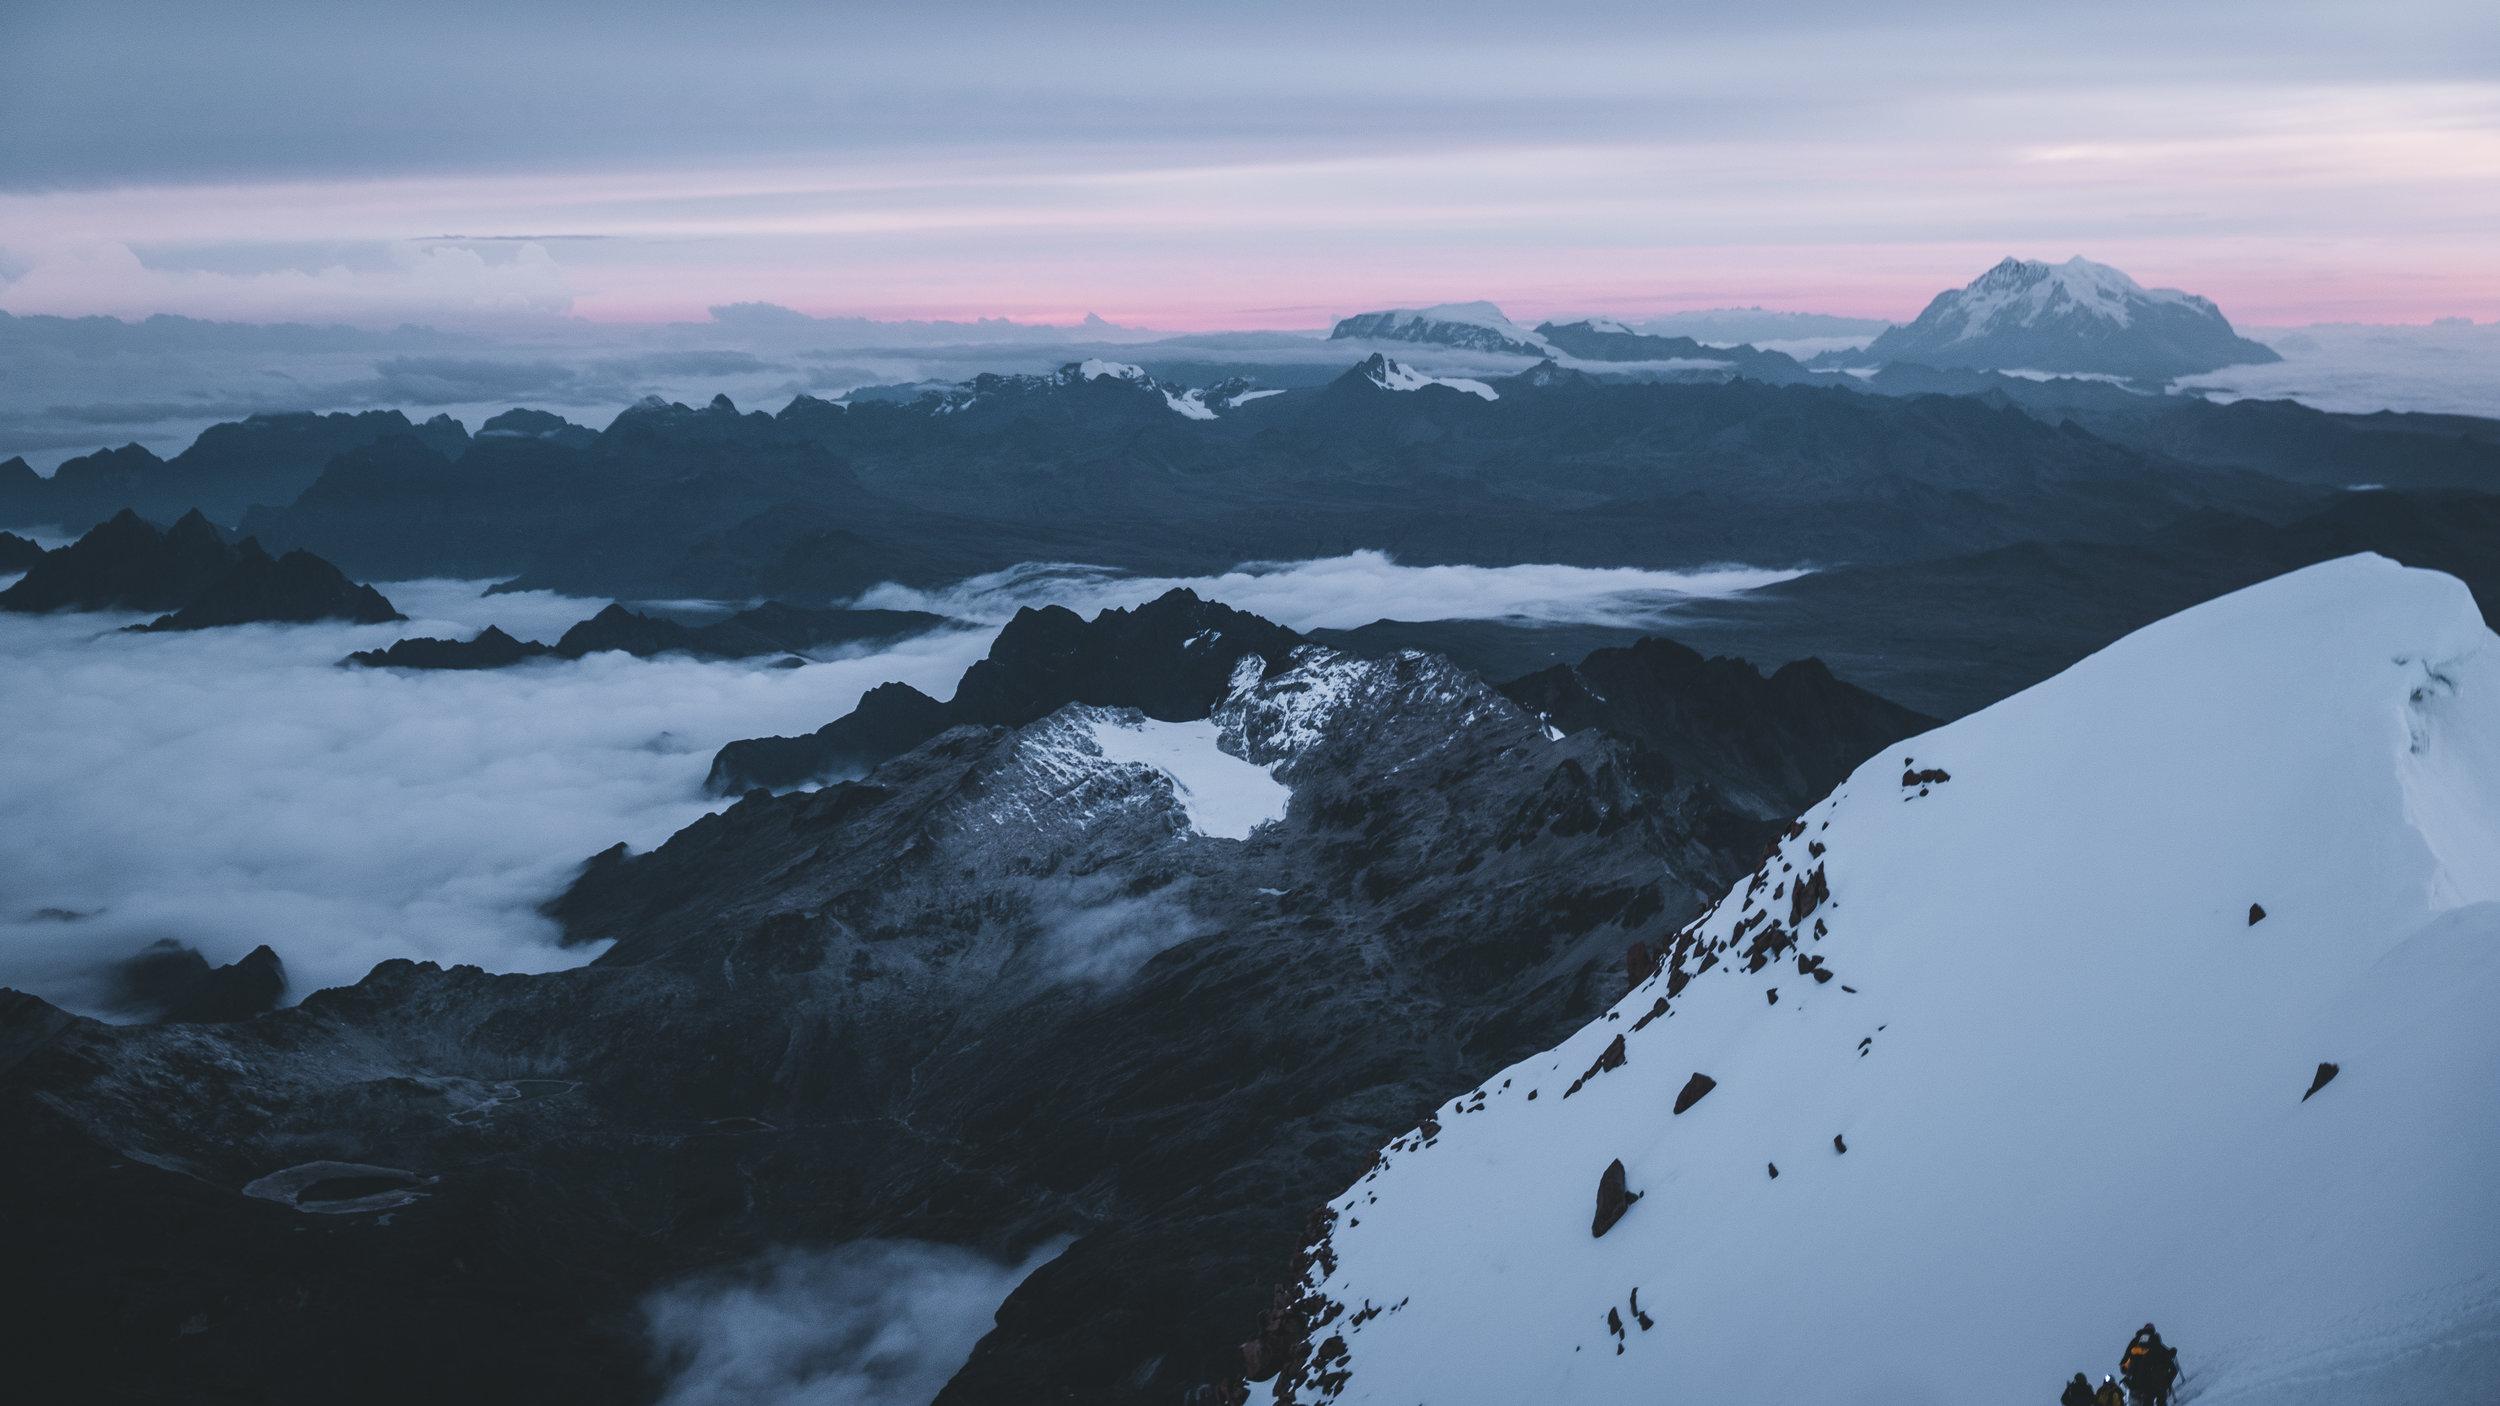 Sunrise high above the clouds | Huayna Potosí